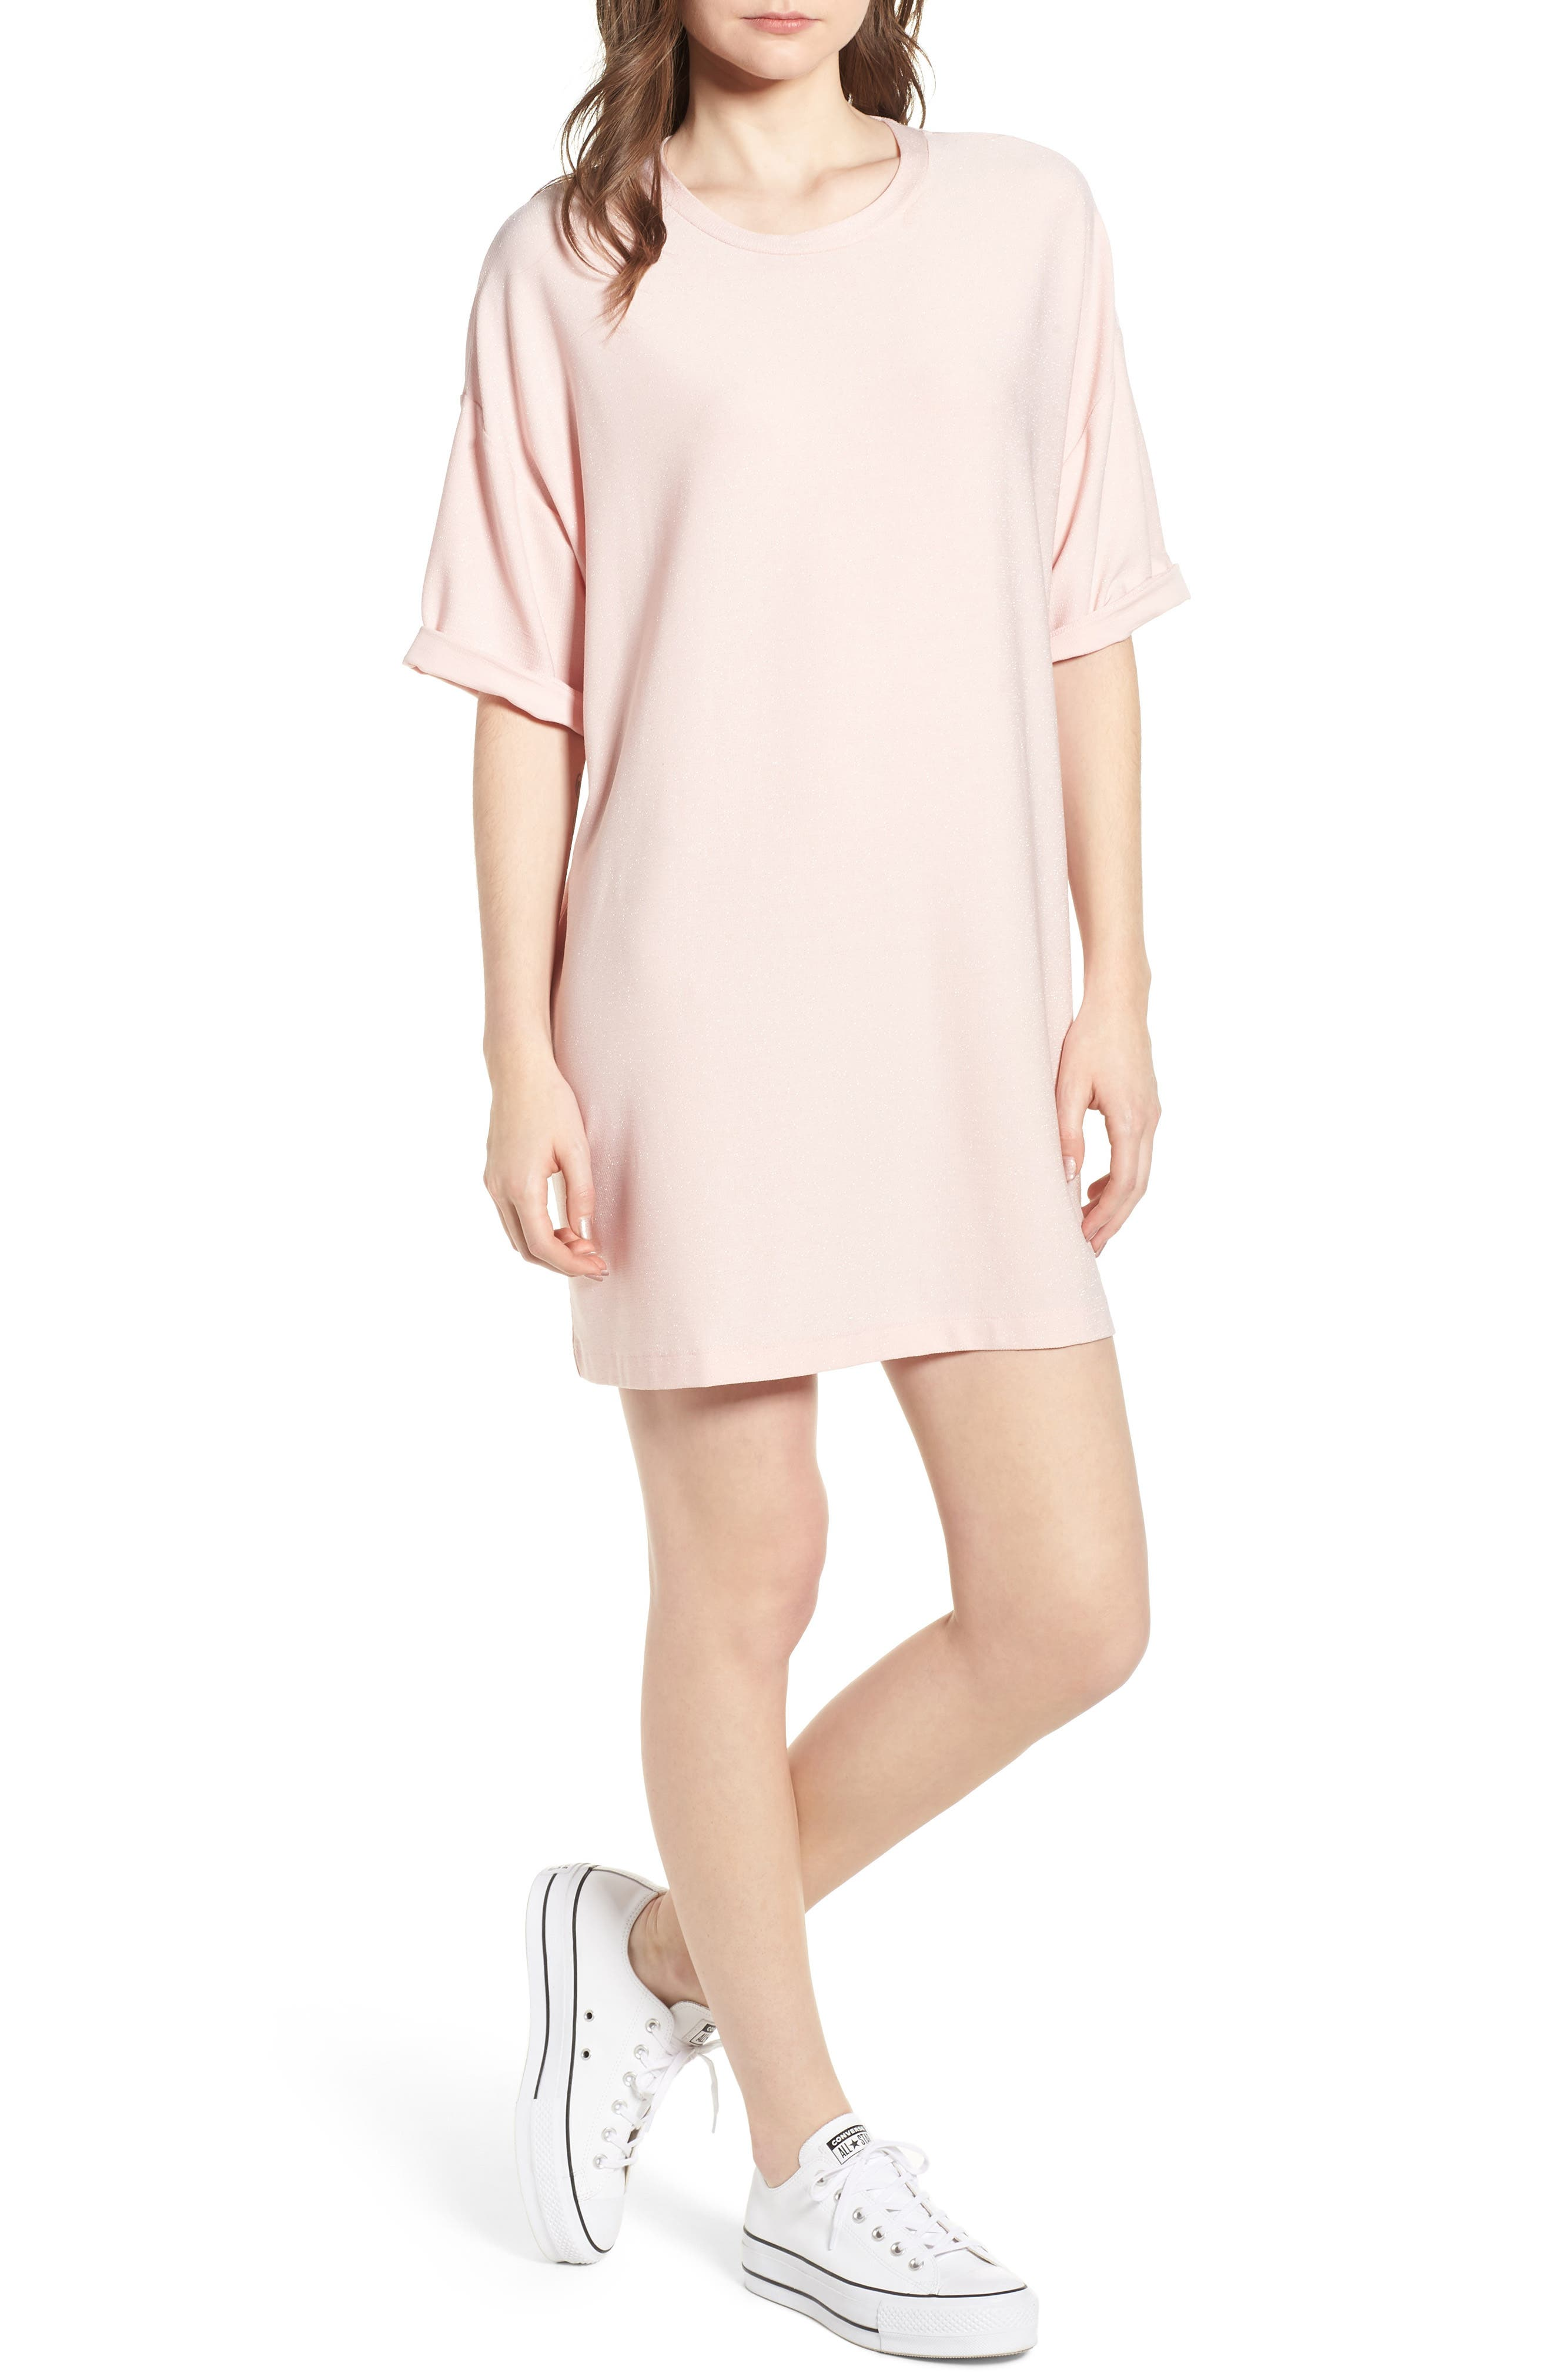 Converse x Miley Cyrus Glitter T-Shirt Dress